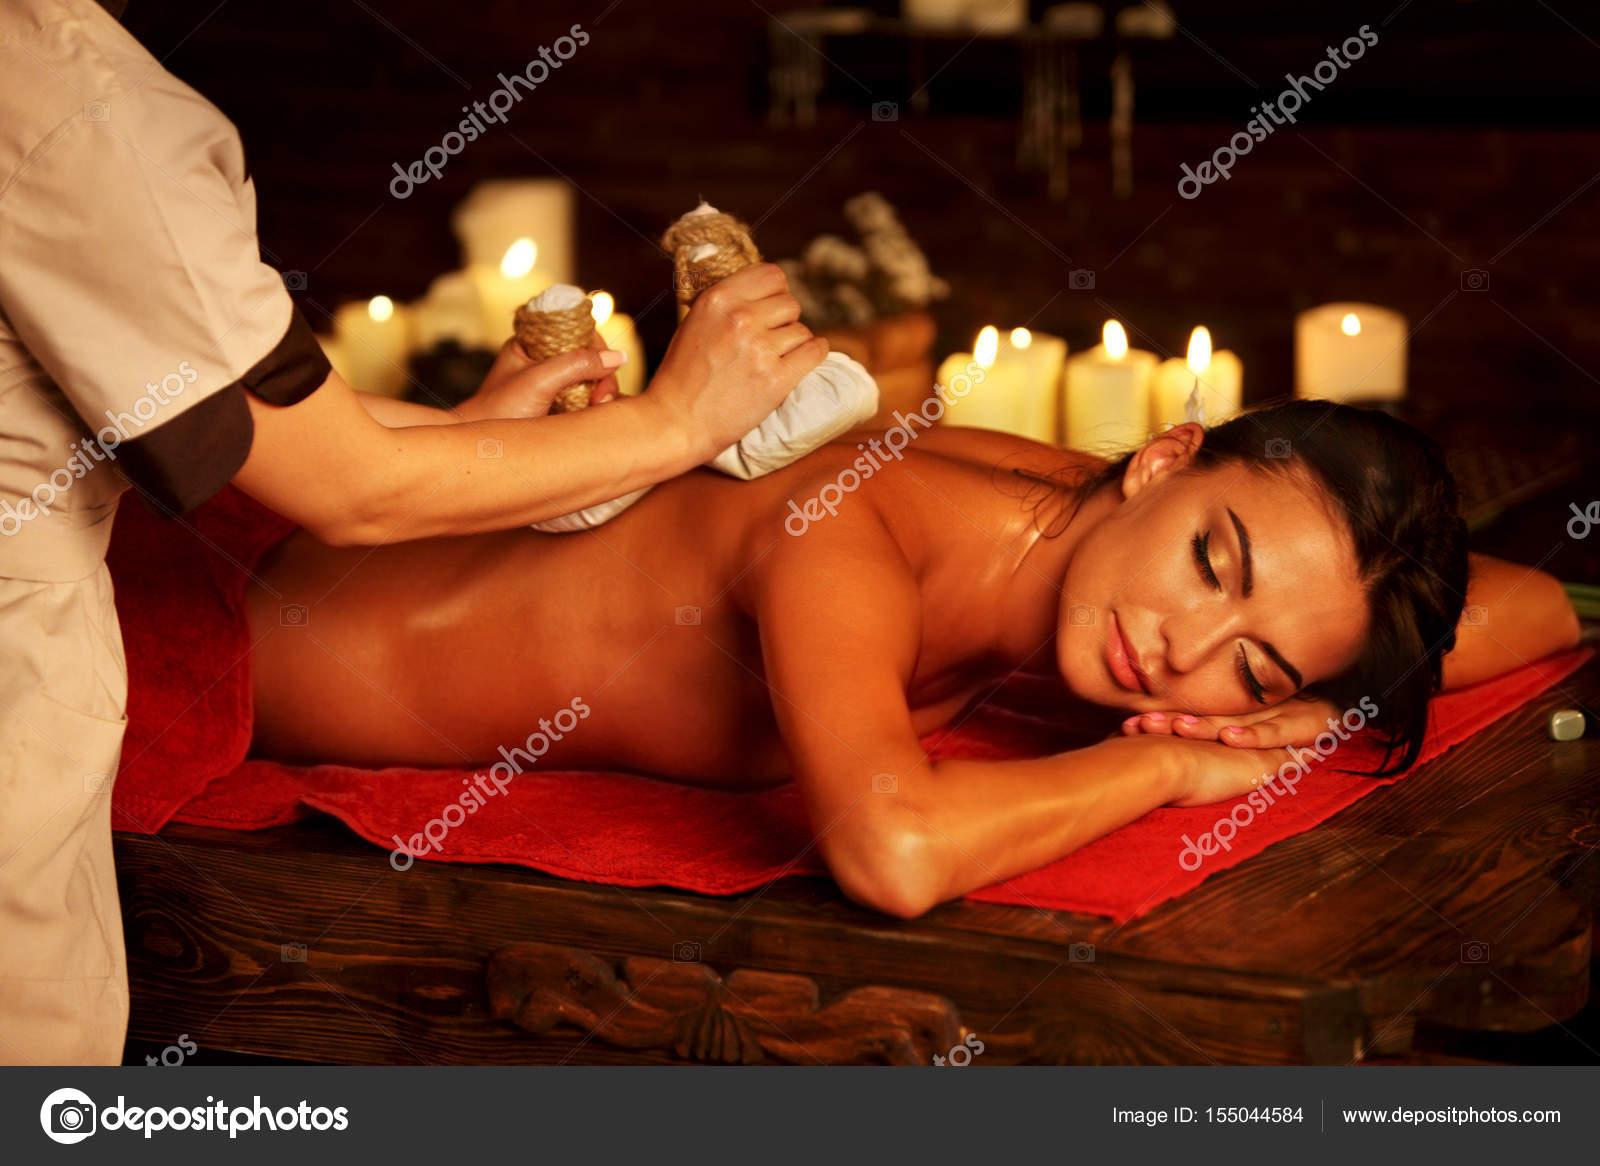 Hot girl spa, virginity black women